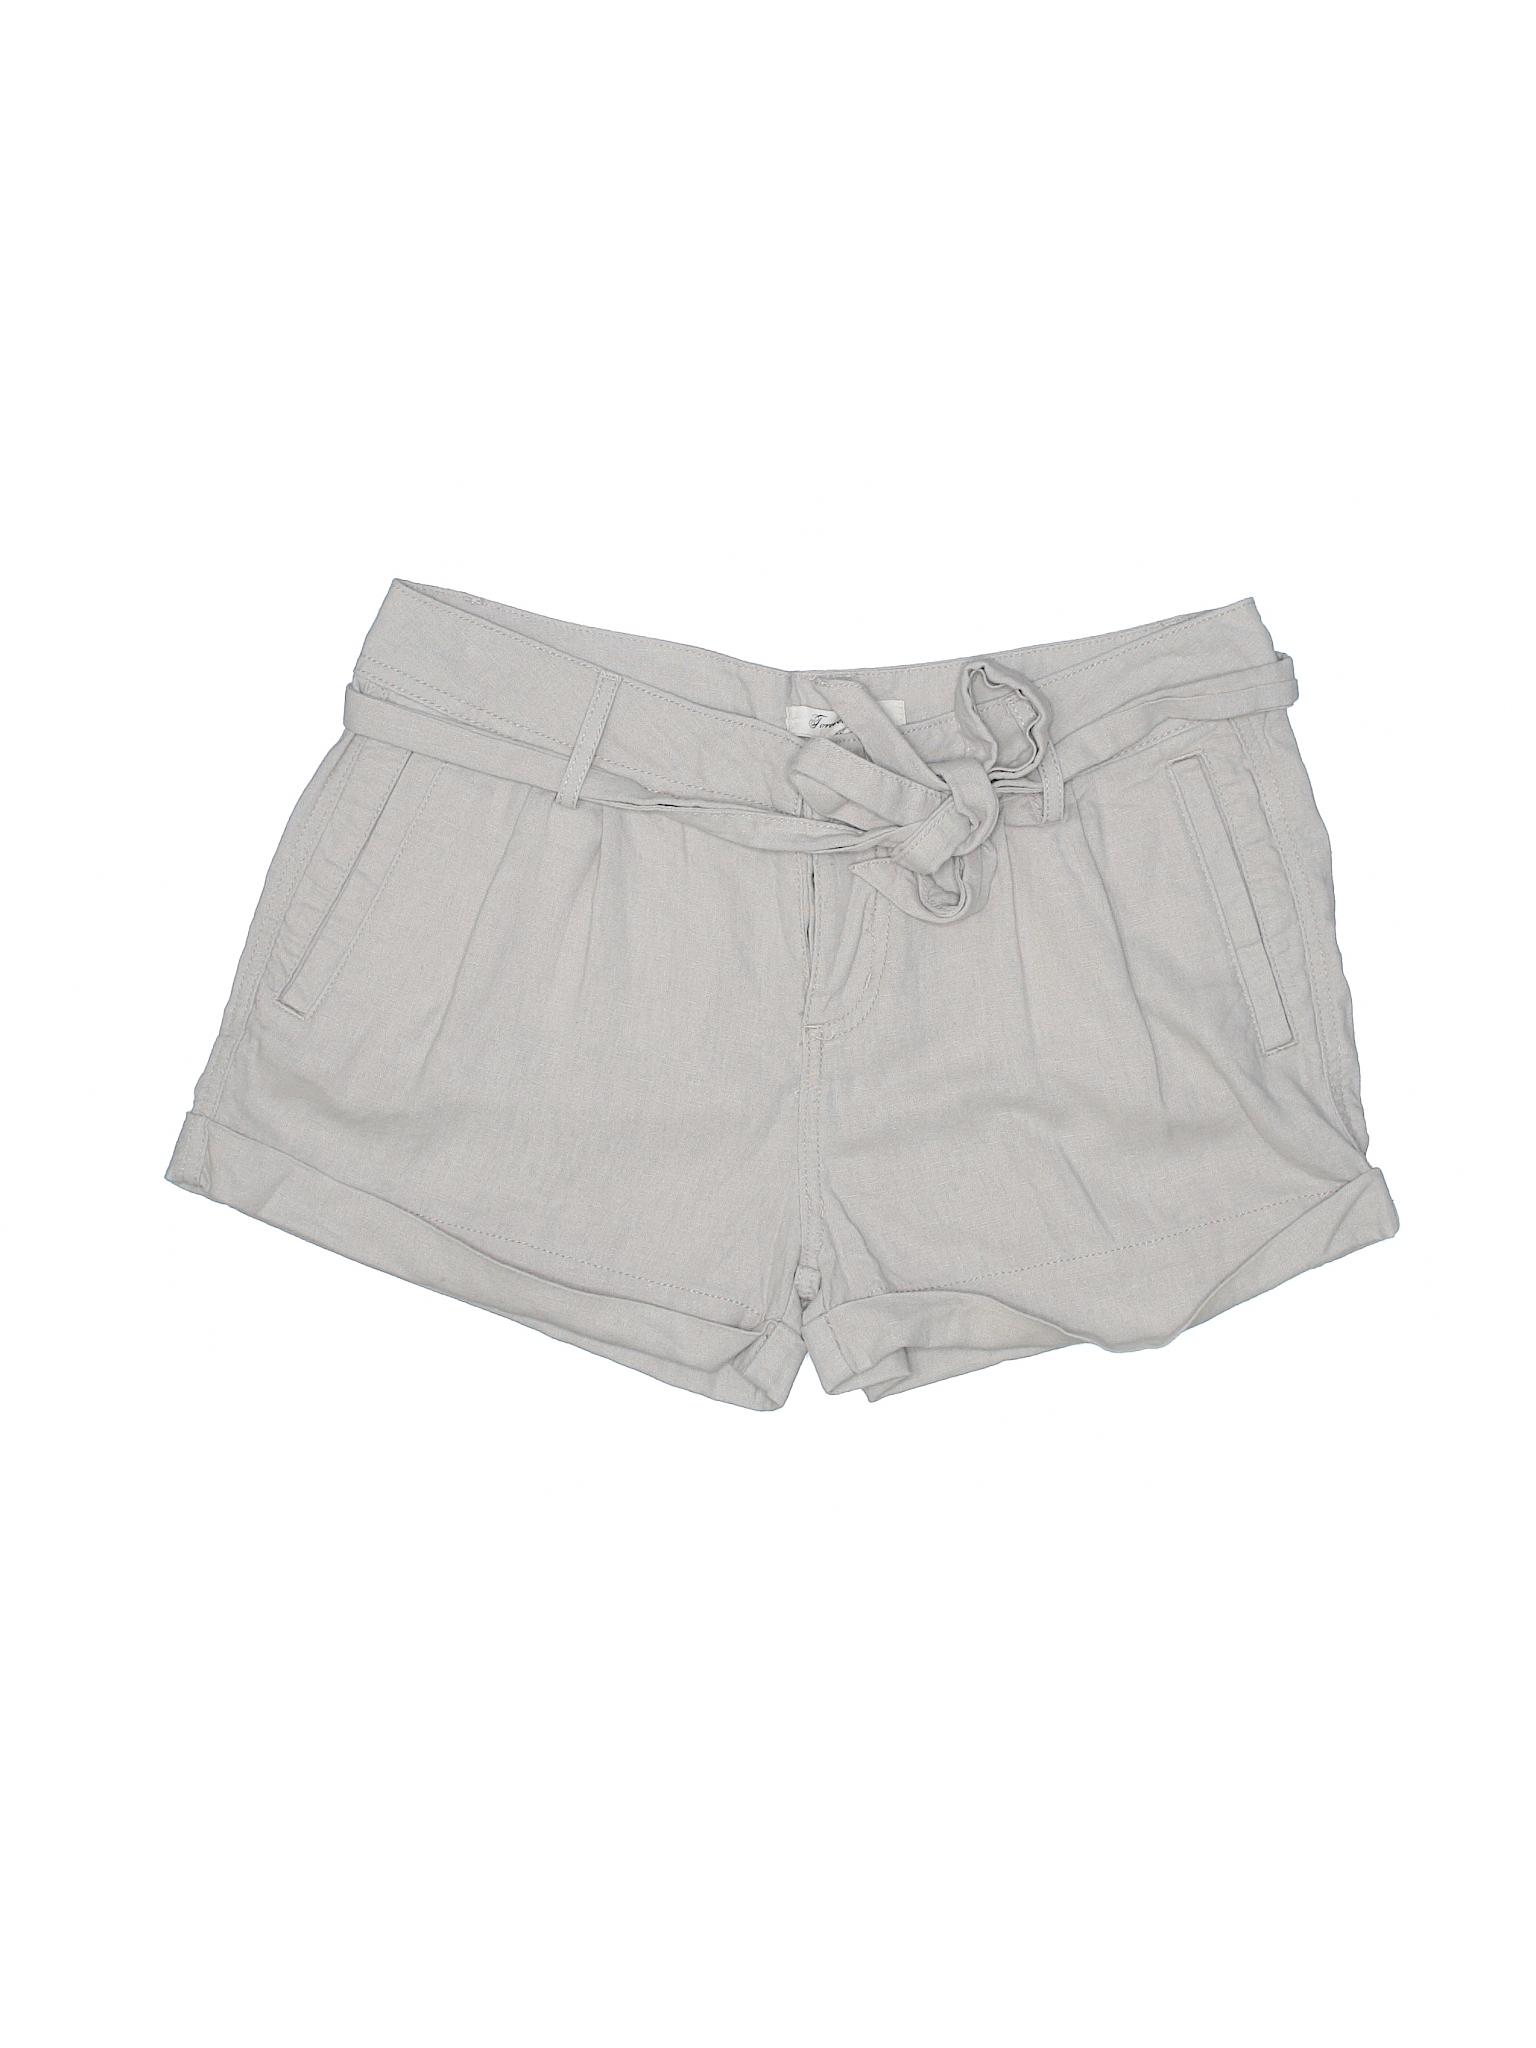 Forever Boutique Forever Shorts Forever 21 Boutique 21 Shorts Boutique xFRfvwvqO